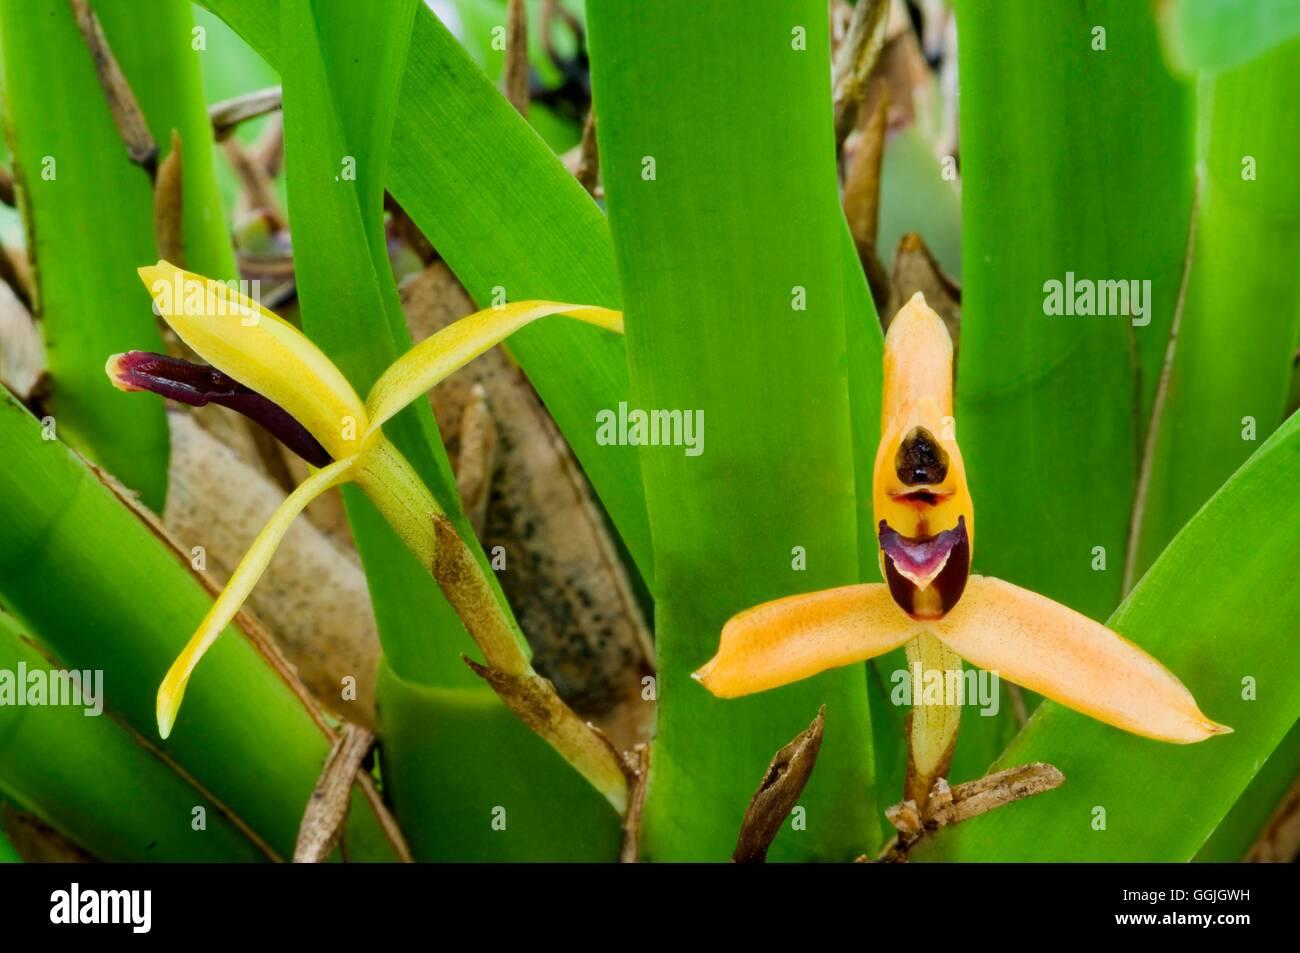 Maxillaria proboscidea   MIW252755 - Stock Image